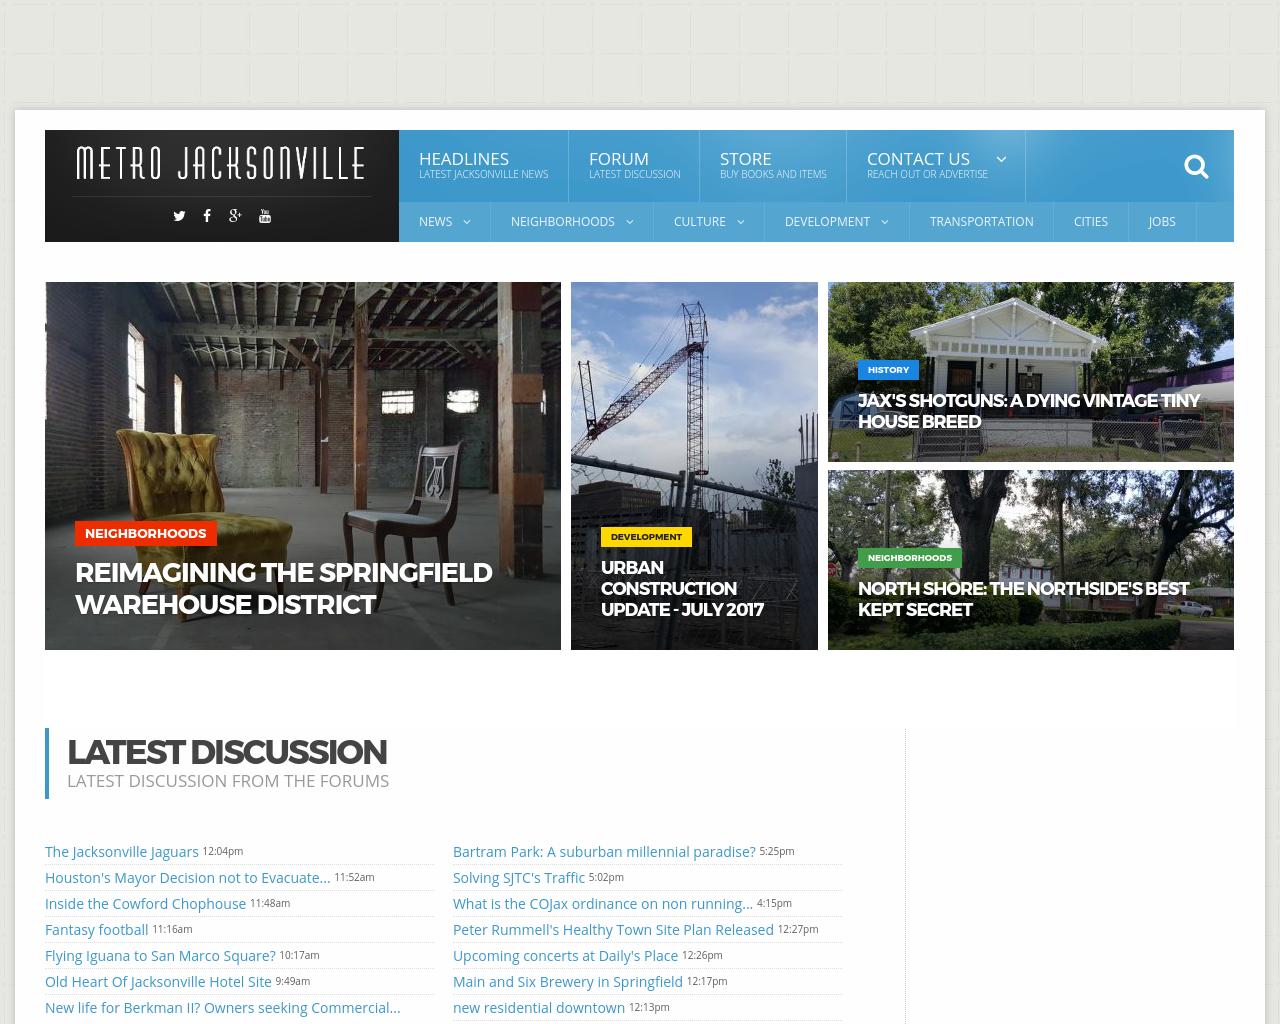 Metro-Jacksonville-Advertising-Reviews-Pricing